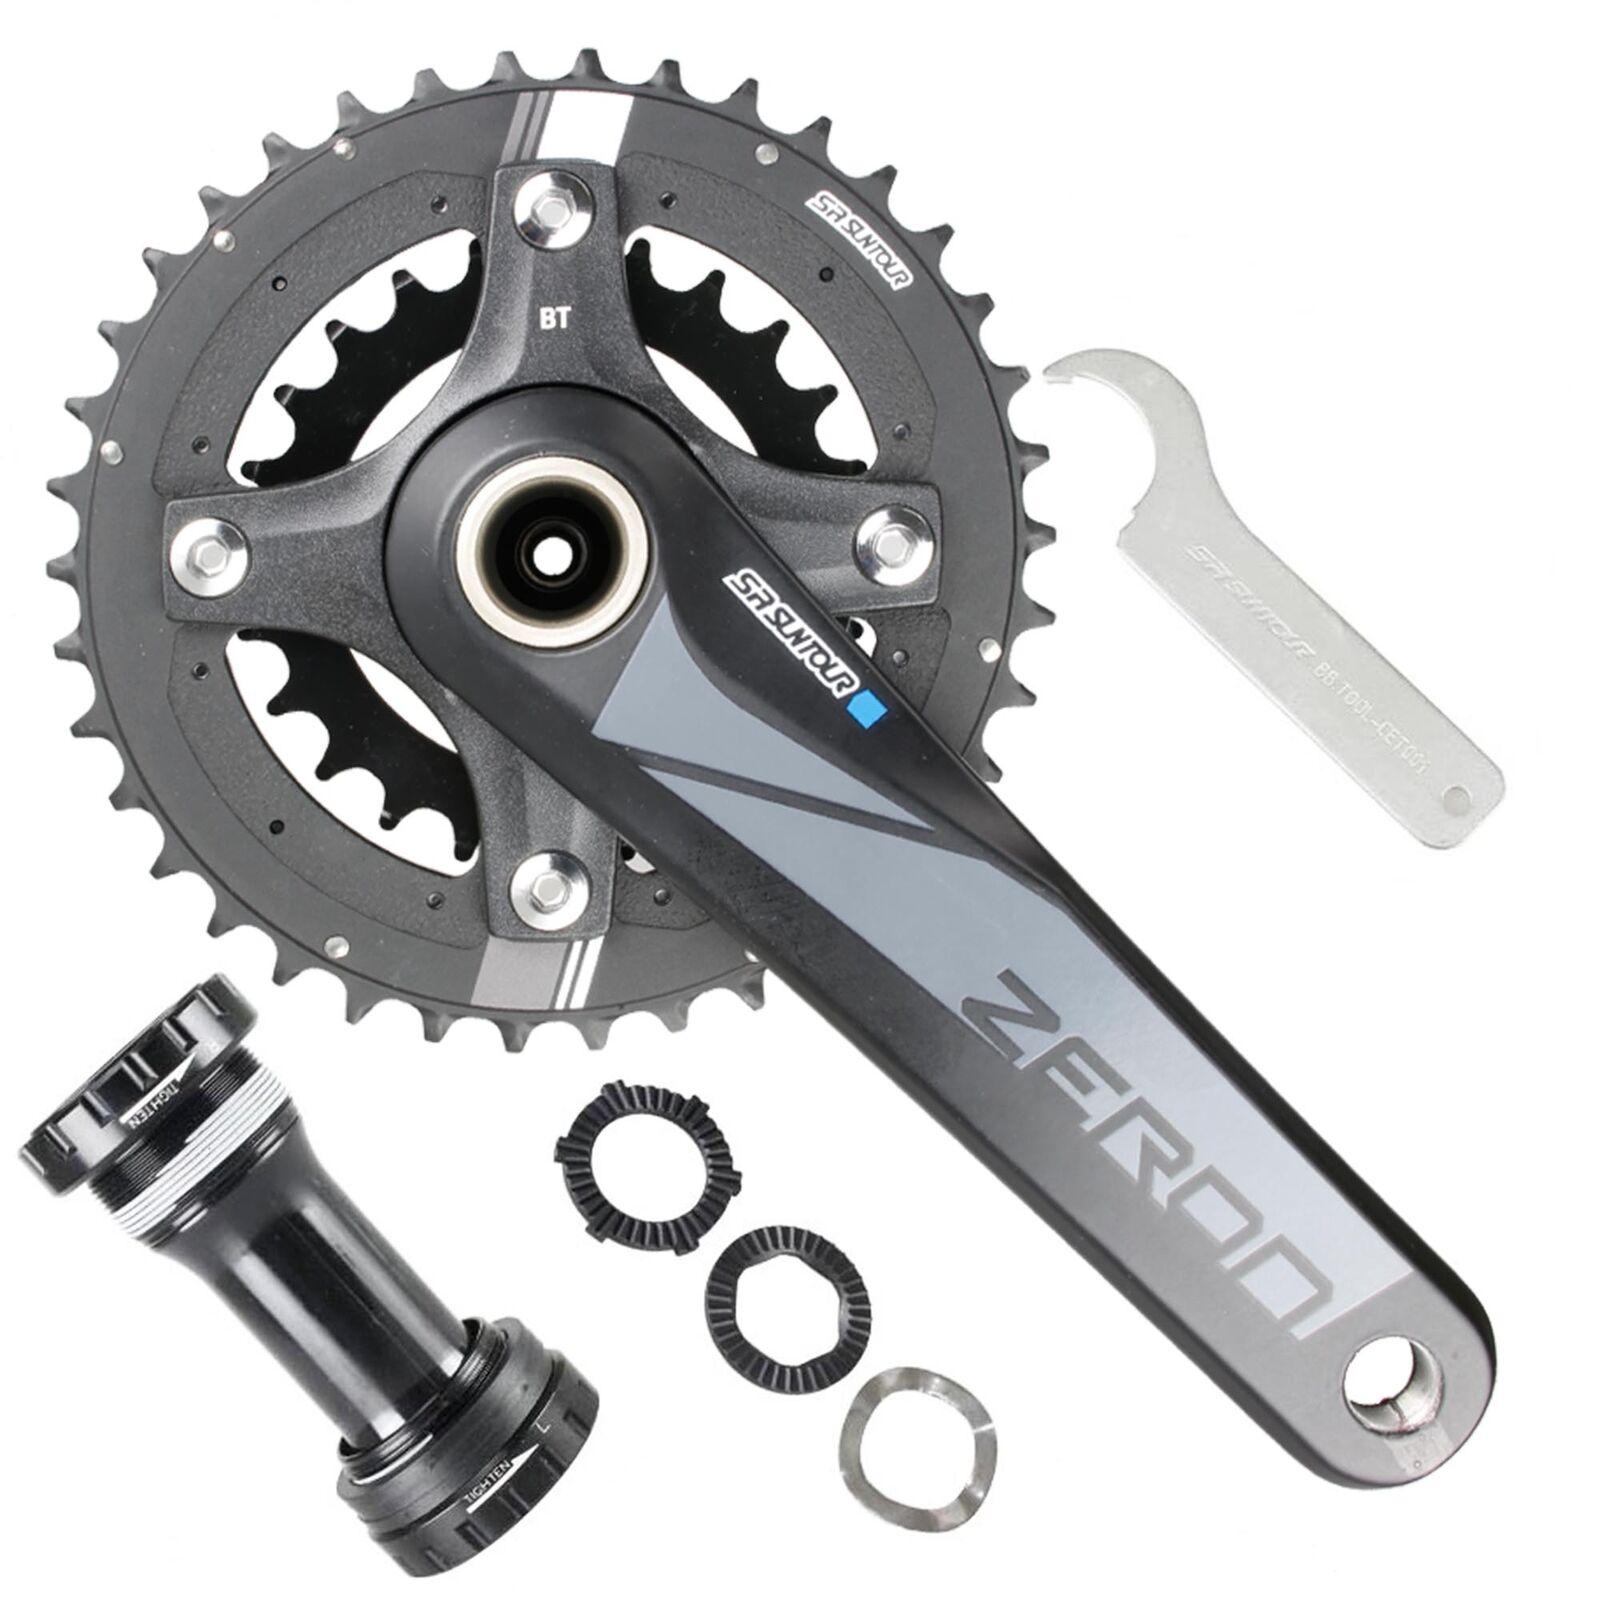 SR Suntour Road Racing Bike Crankset Zeron 2X 24-38T 175mm with BB 10 Speed